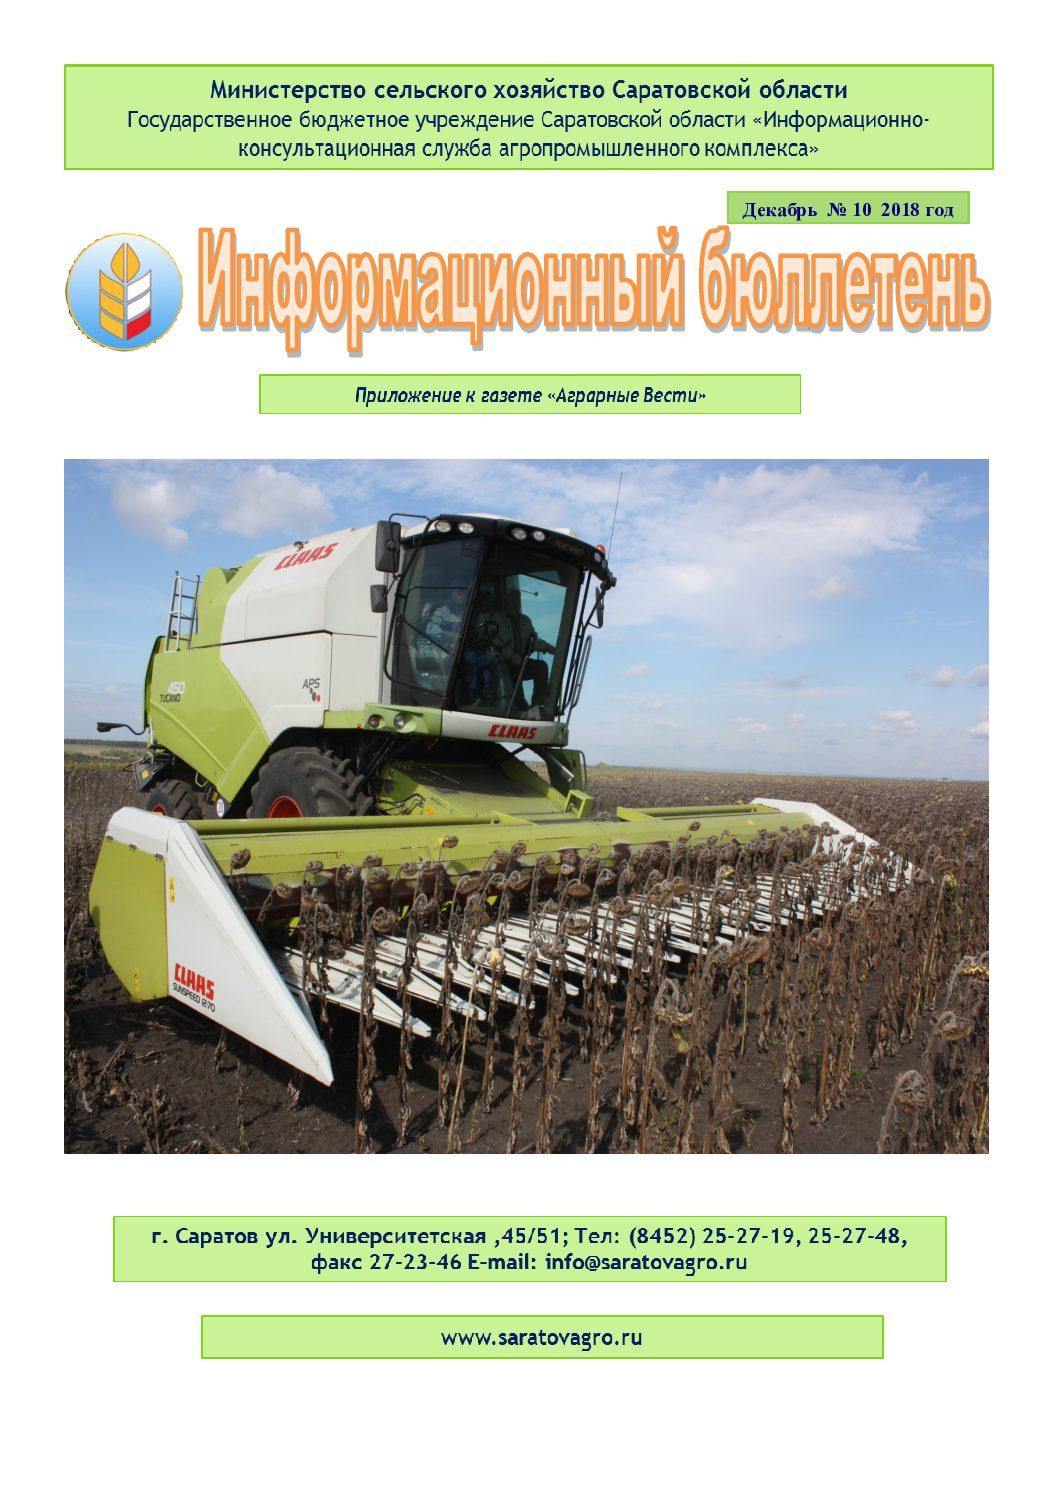 https://saratovagro.ru/wp-content/uploads/2020/08/10.2018-1-pdf.jpg